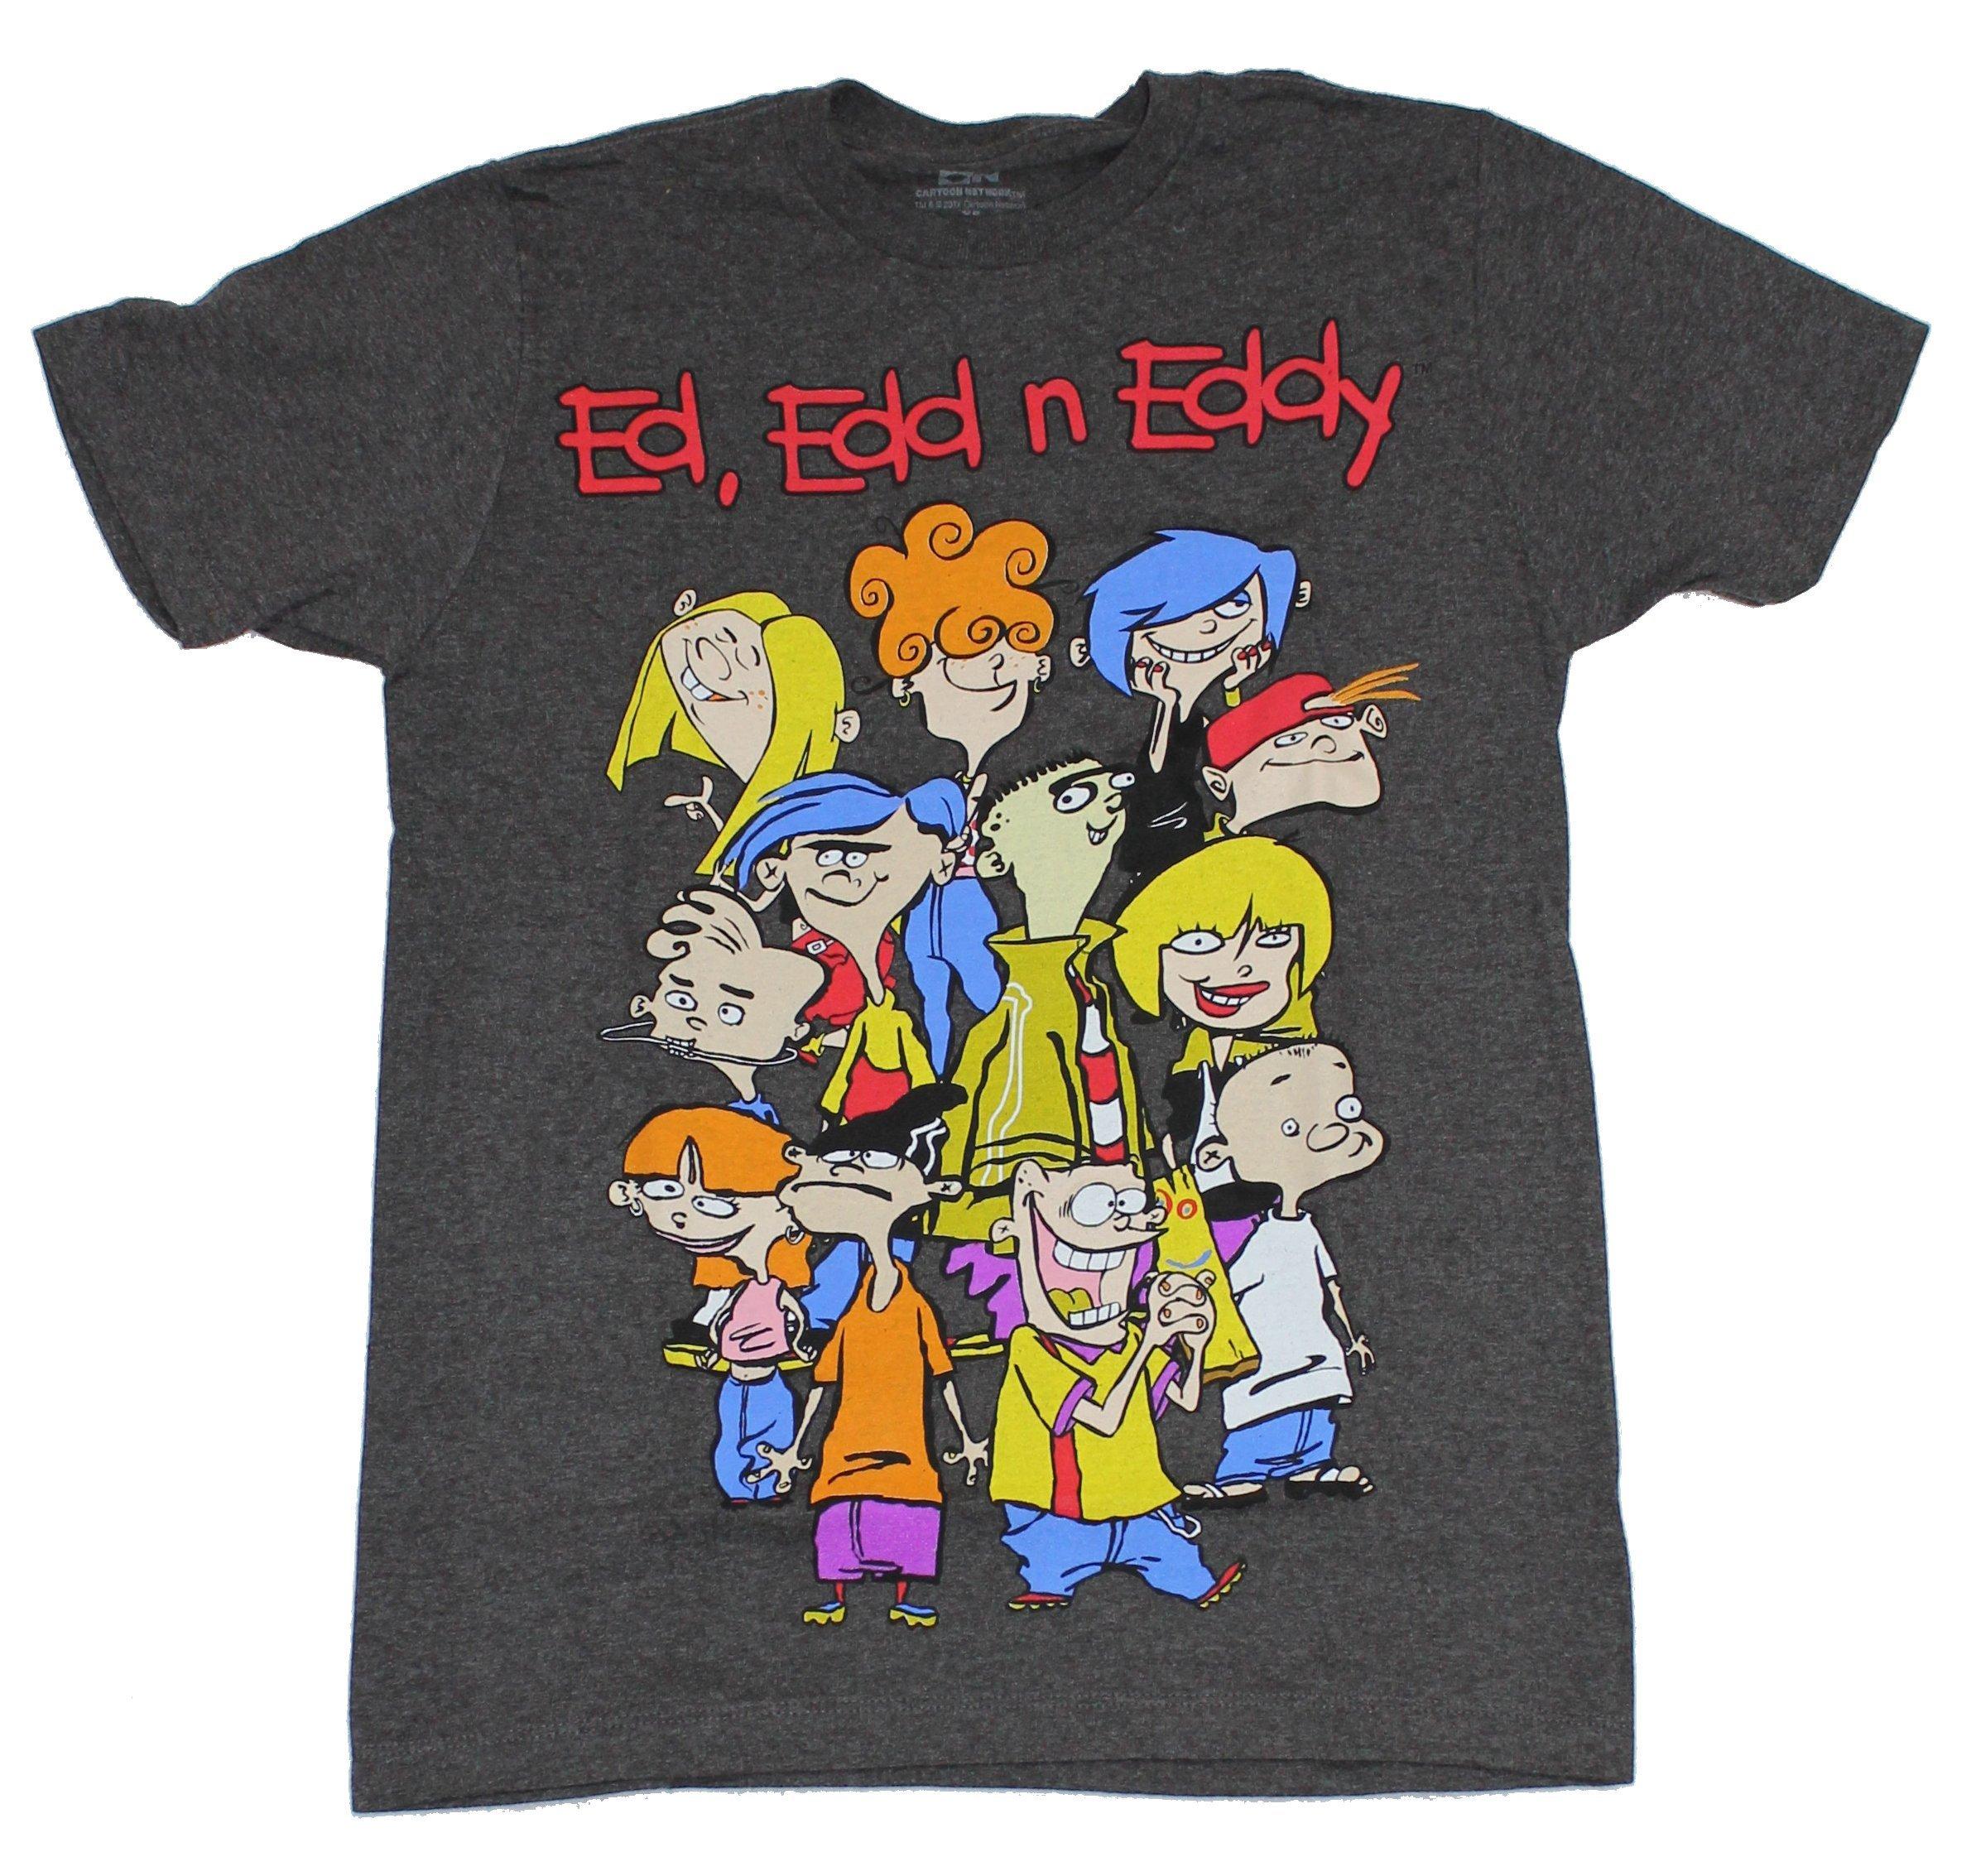 Edd n Eddy Eds On Bikes Gray Heather Adult T-Shirt Ed